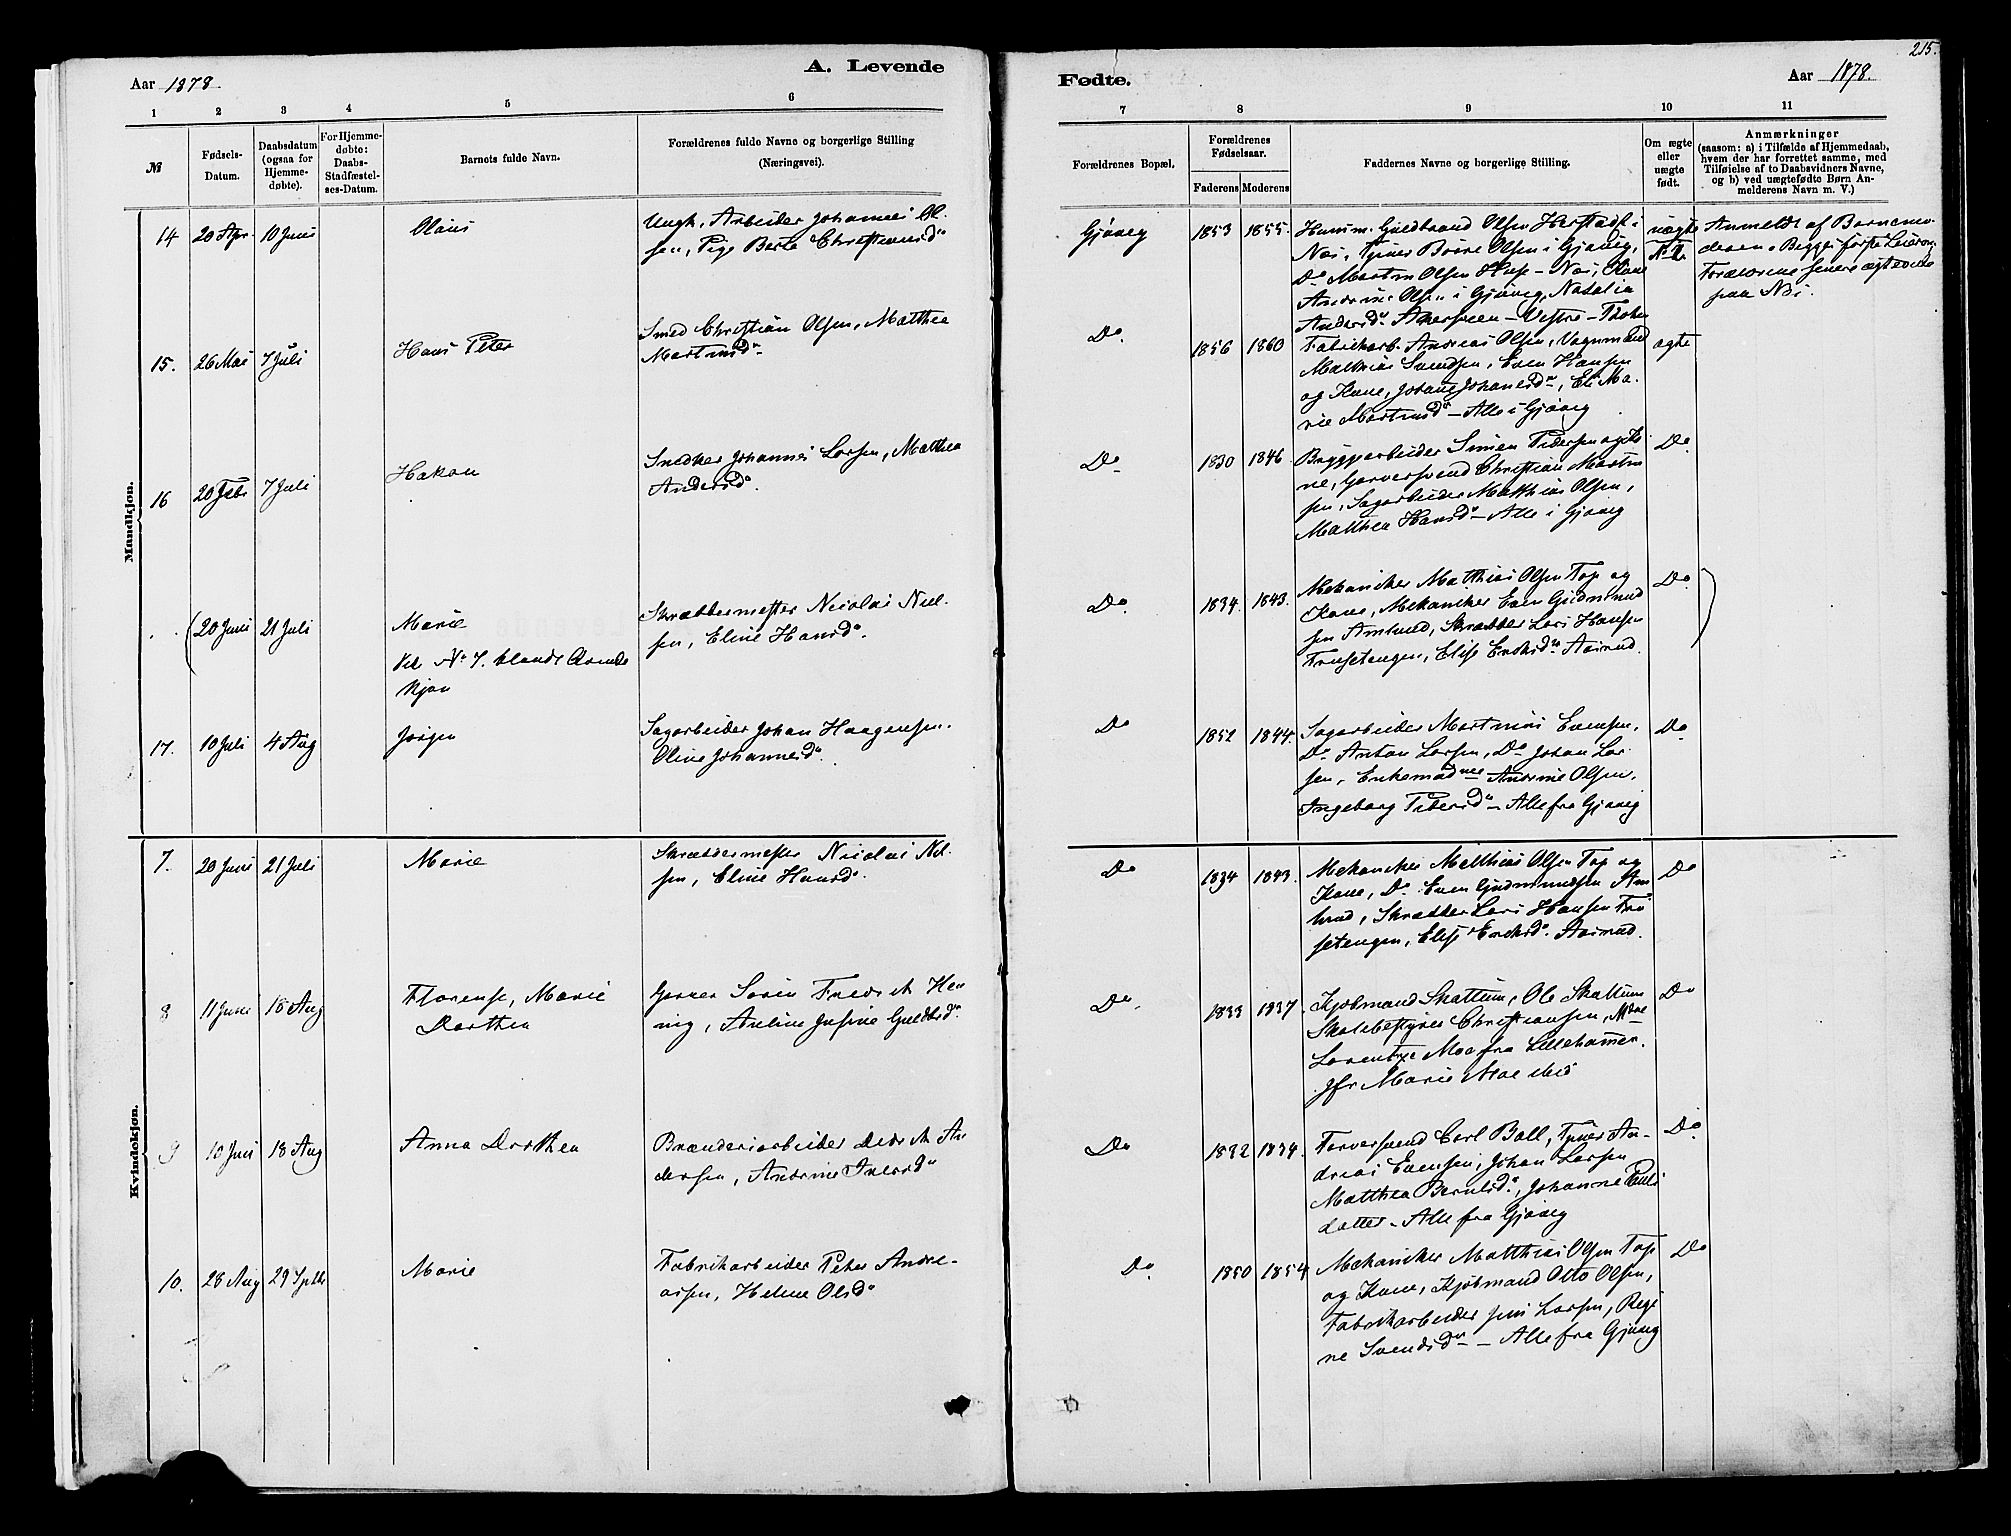 SAH, Vardal prestekontor, H/Ha/Haa/L0008: Ministerialbok nr. 8, 1878-1890, s. 215